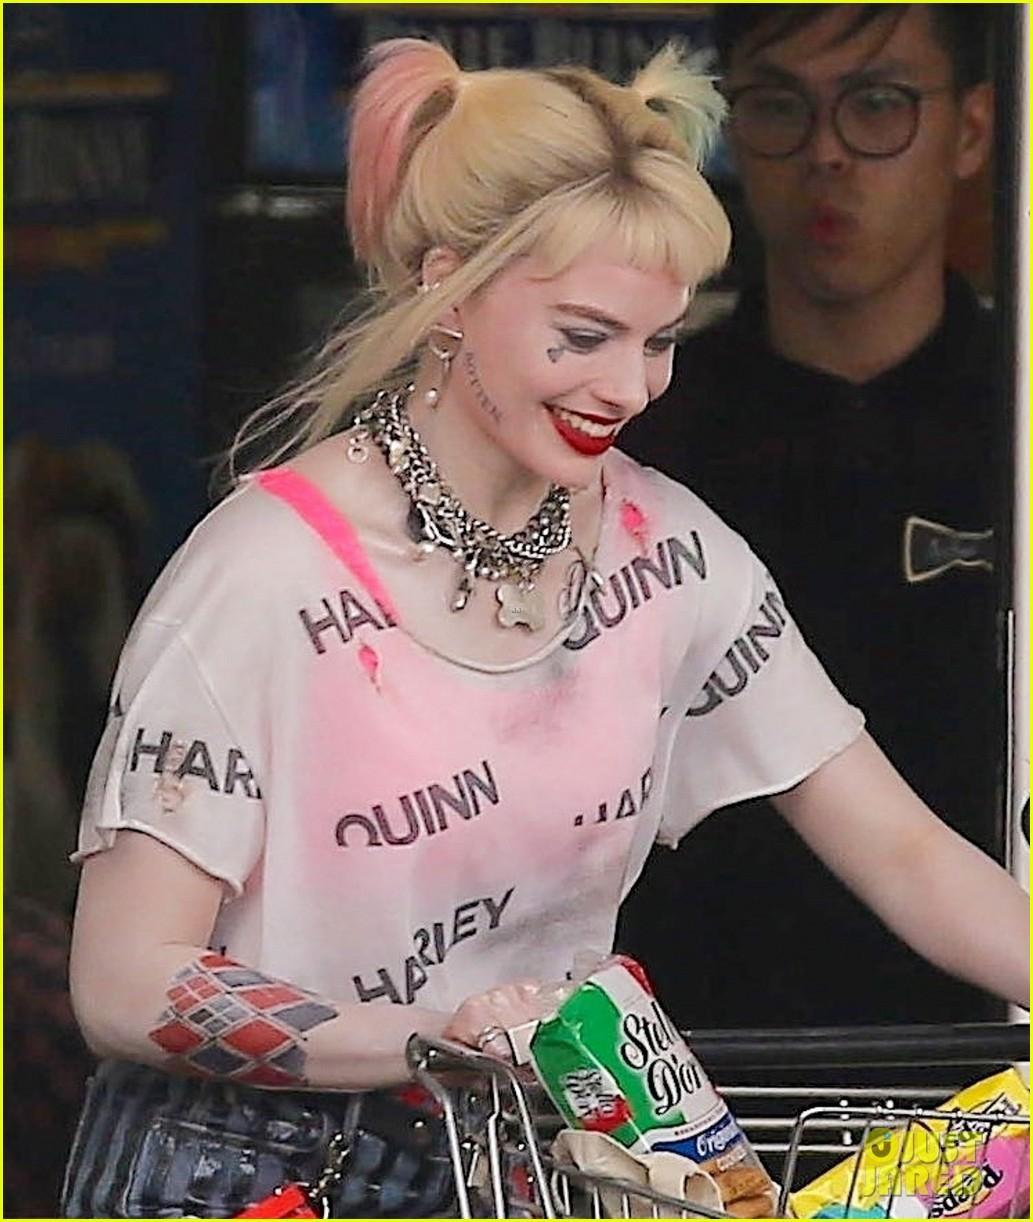 Margot Robbie Goes Snack Shopping As Harley Quinn For Birds Of Prey Scene Photo 4272039 Birds Of Prey Ella Jay Basco Margot Robbie Pictures Just Jared